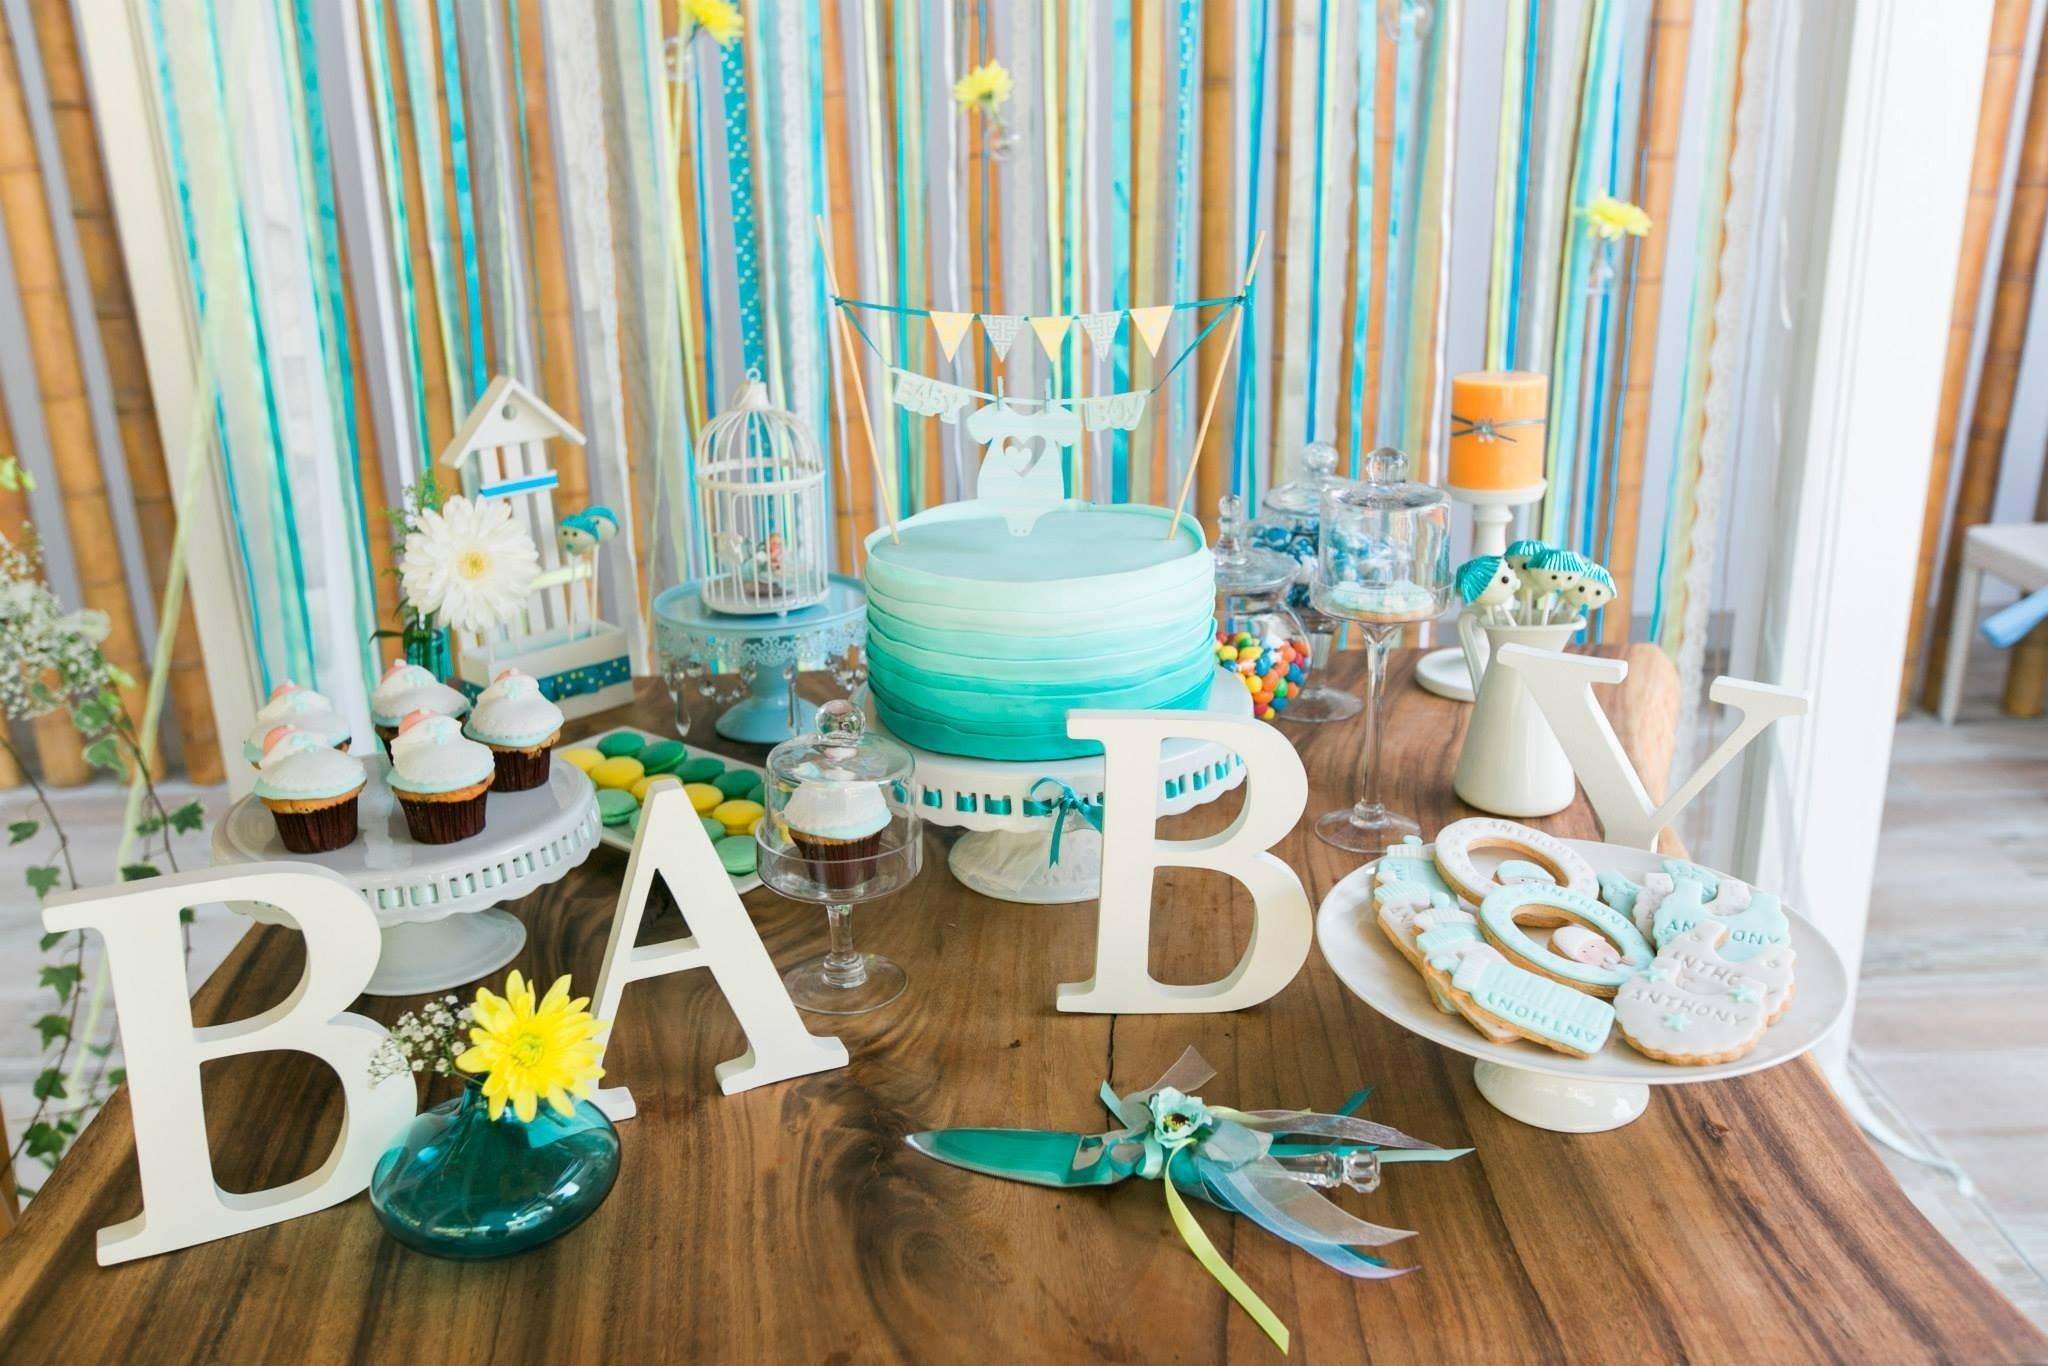 10 Unique Cute Baby Boy Shower Ideas ideas rubber duck theme baby shower boy decoration formidable themes 2020